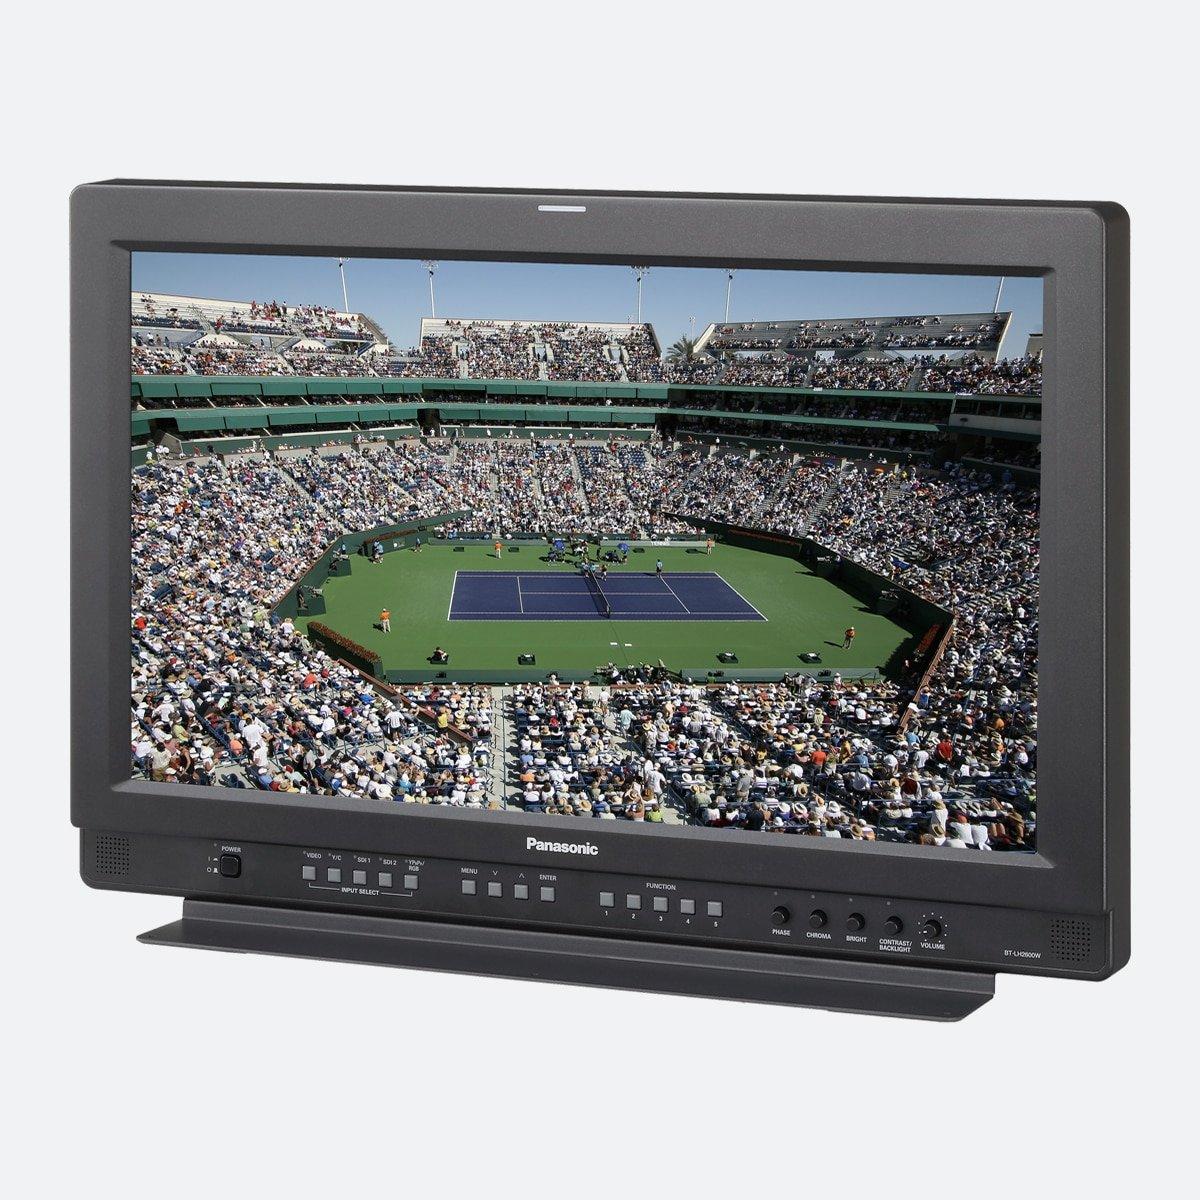 Panasonic BTLH-2600W